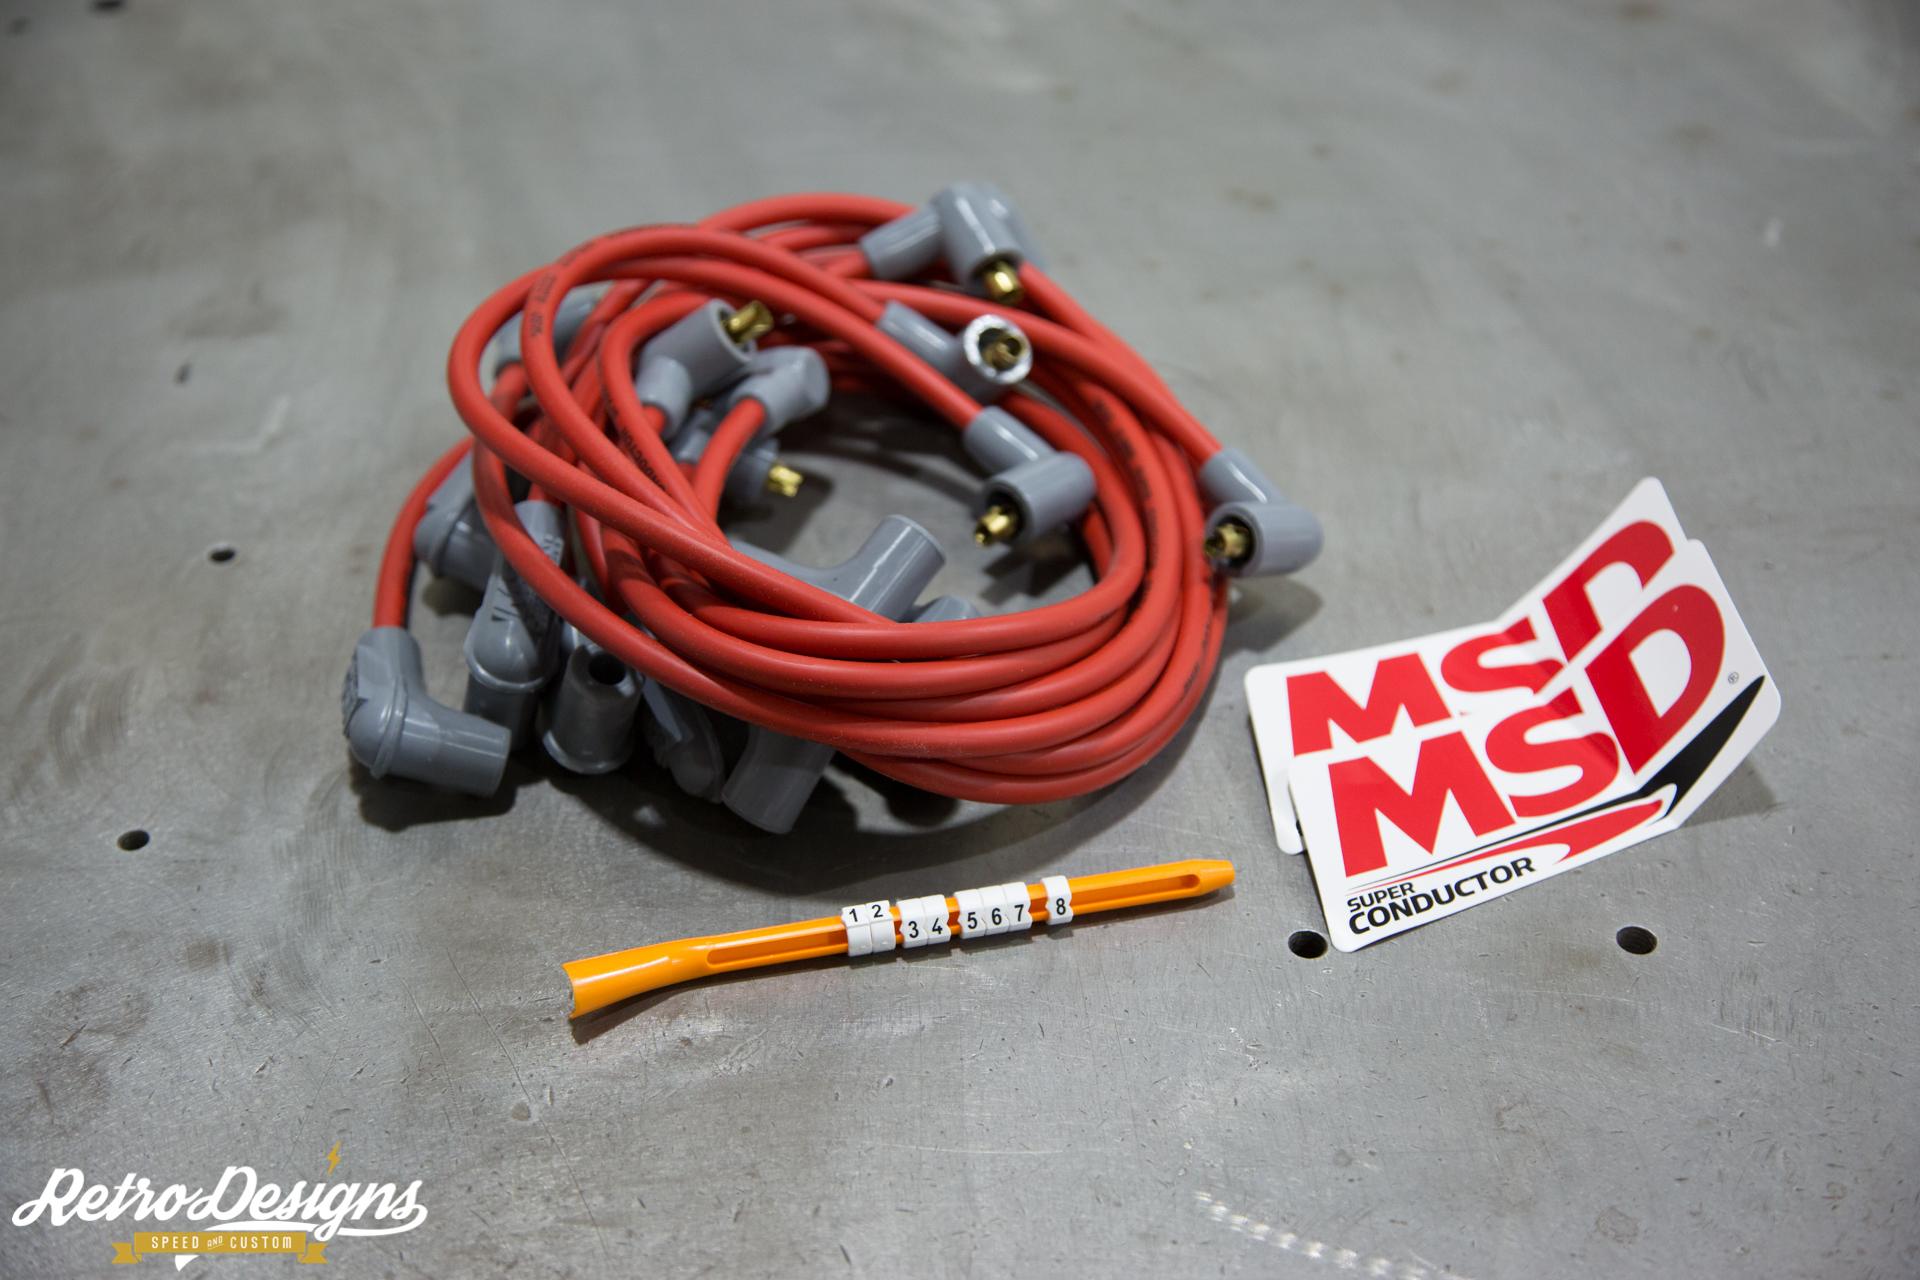 Retro Designs Speed & Custom | Universal MSD Wires